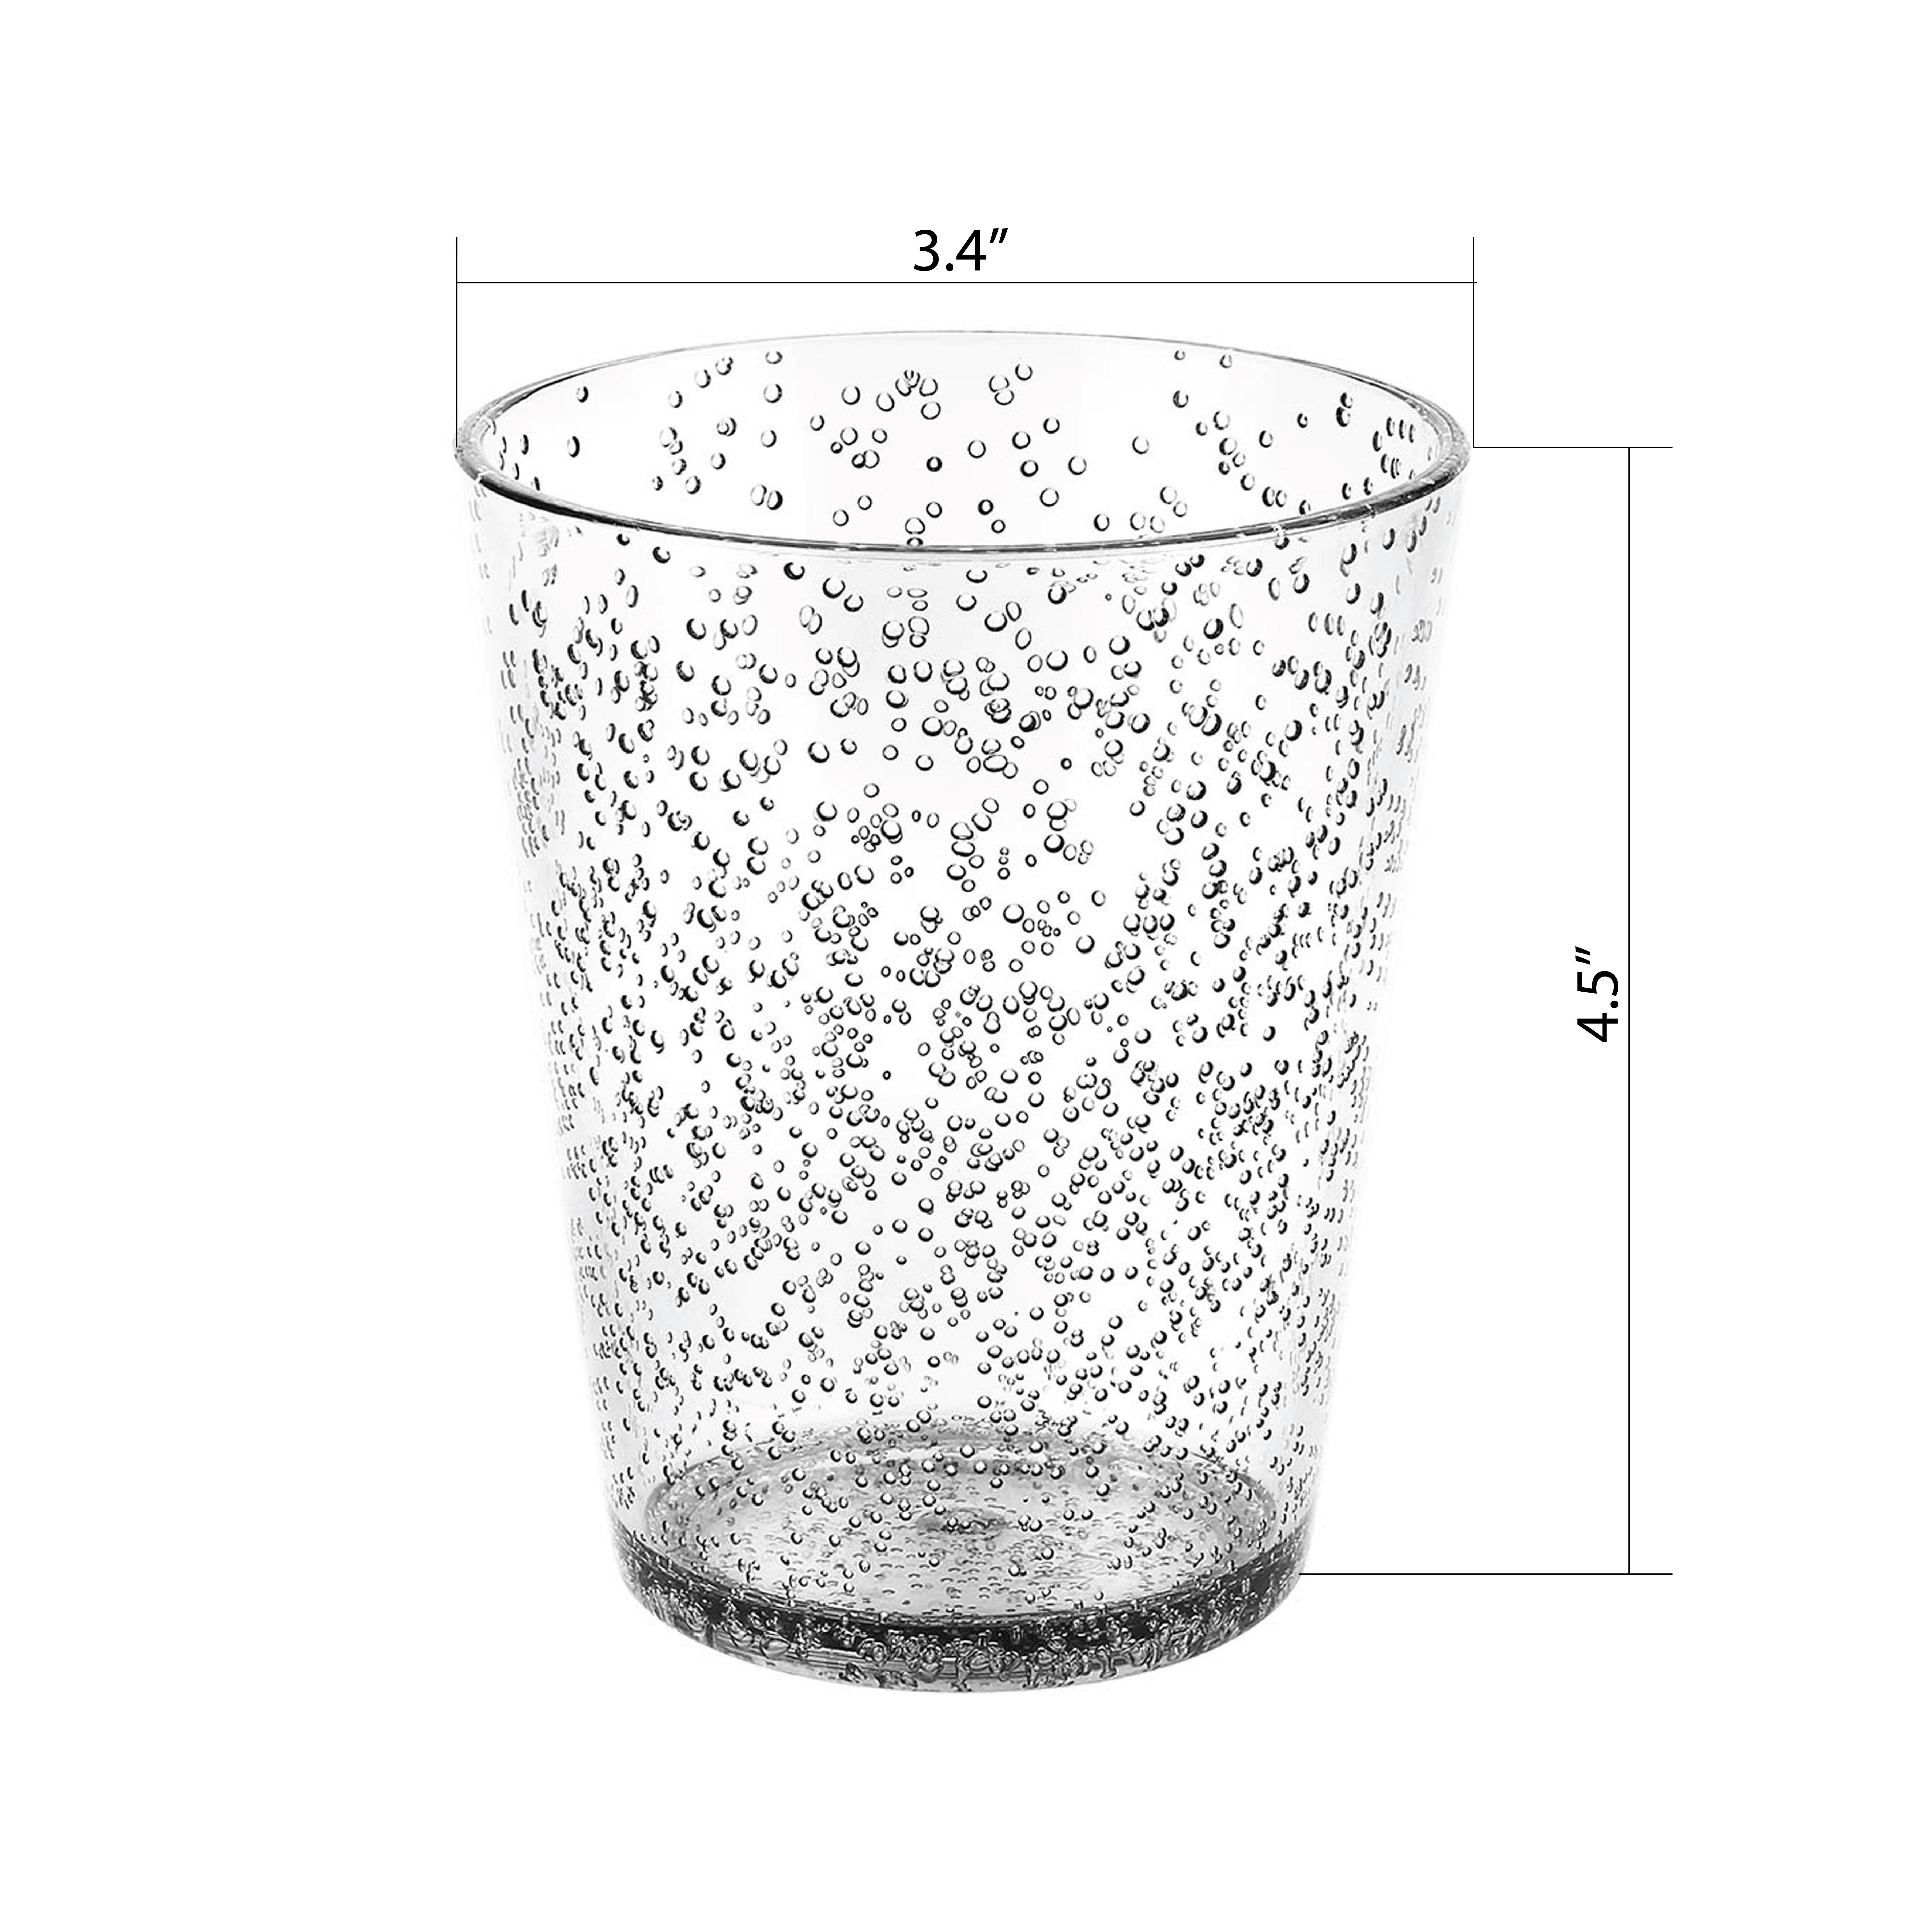 Spritz 16 ounce Old-Fashion Glass, Black